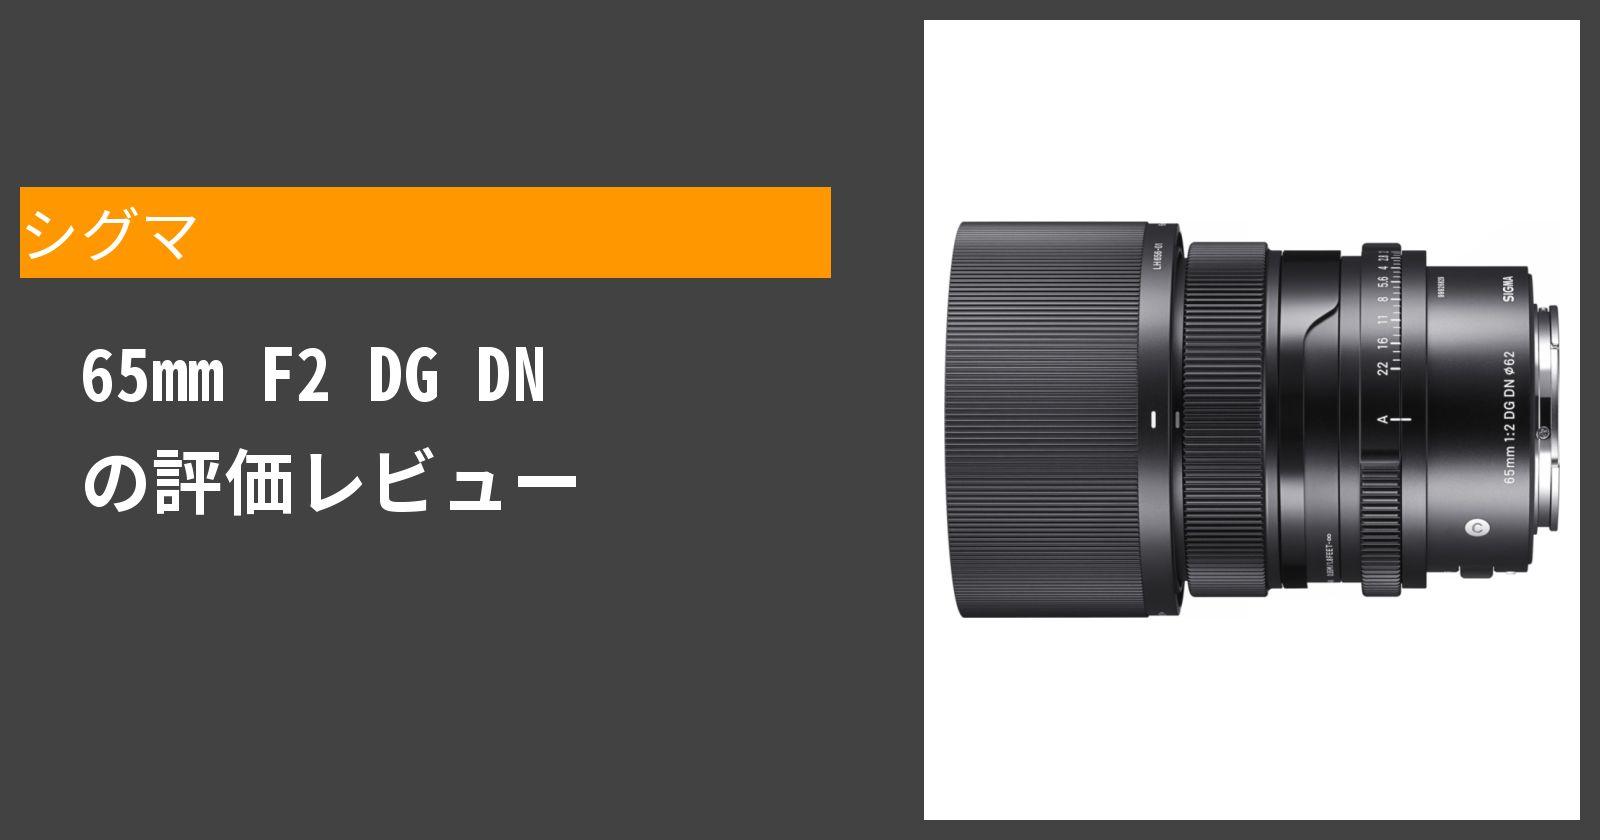 65mm F2 DG DNを徹底評価